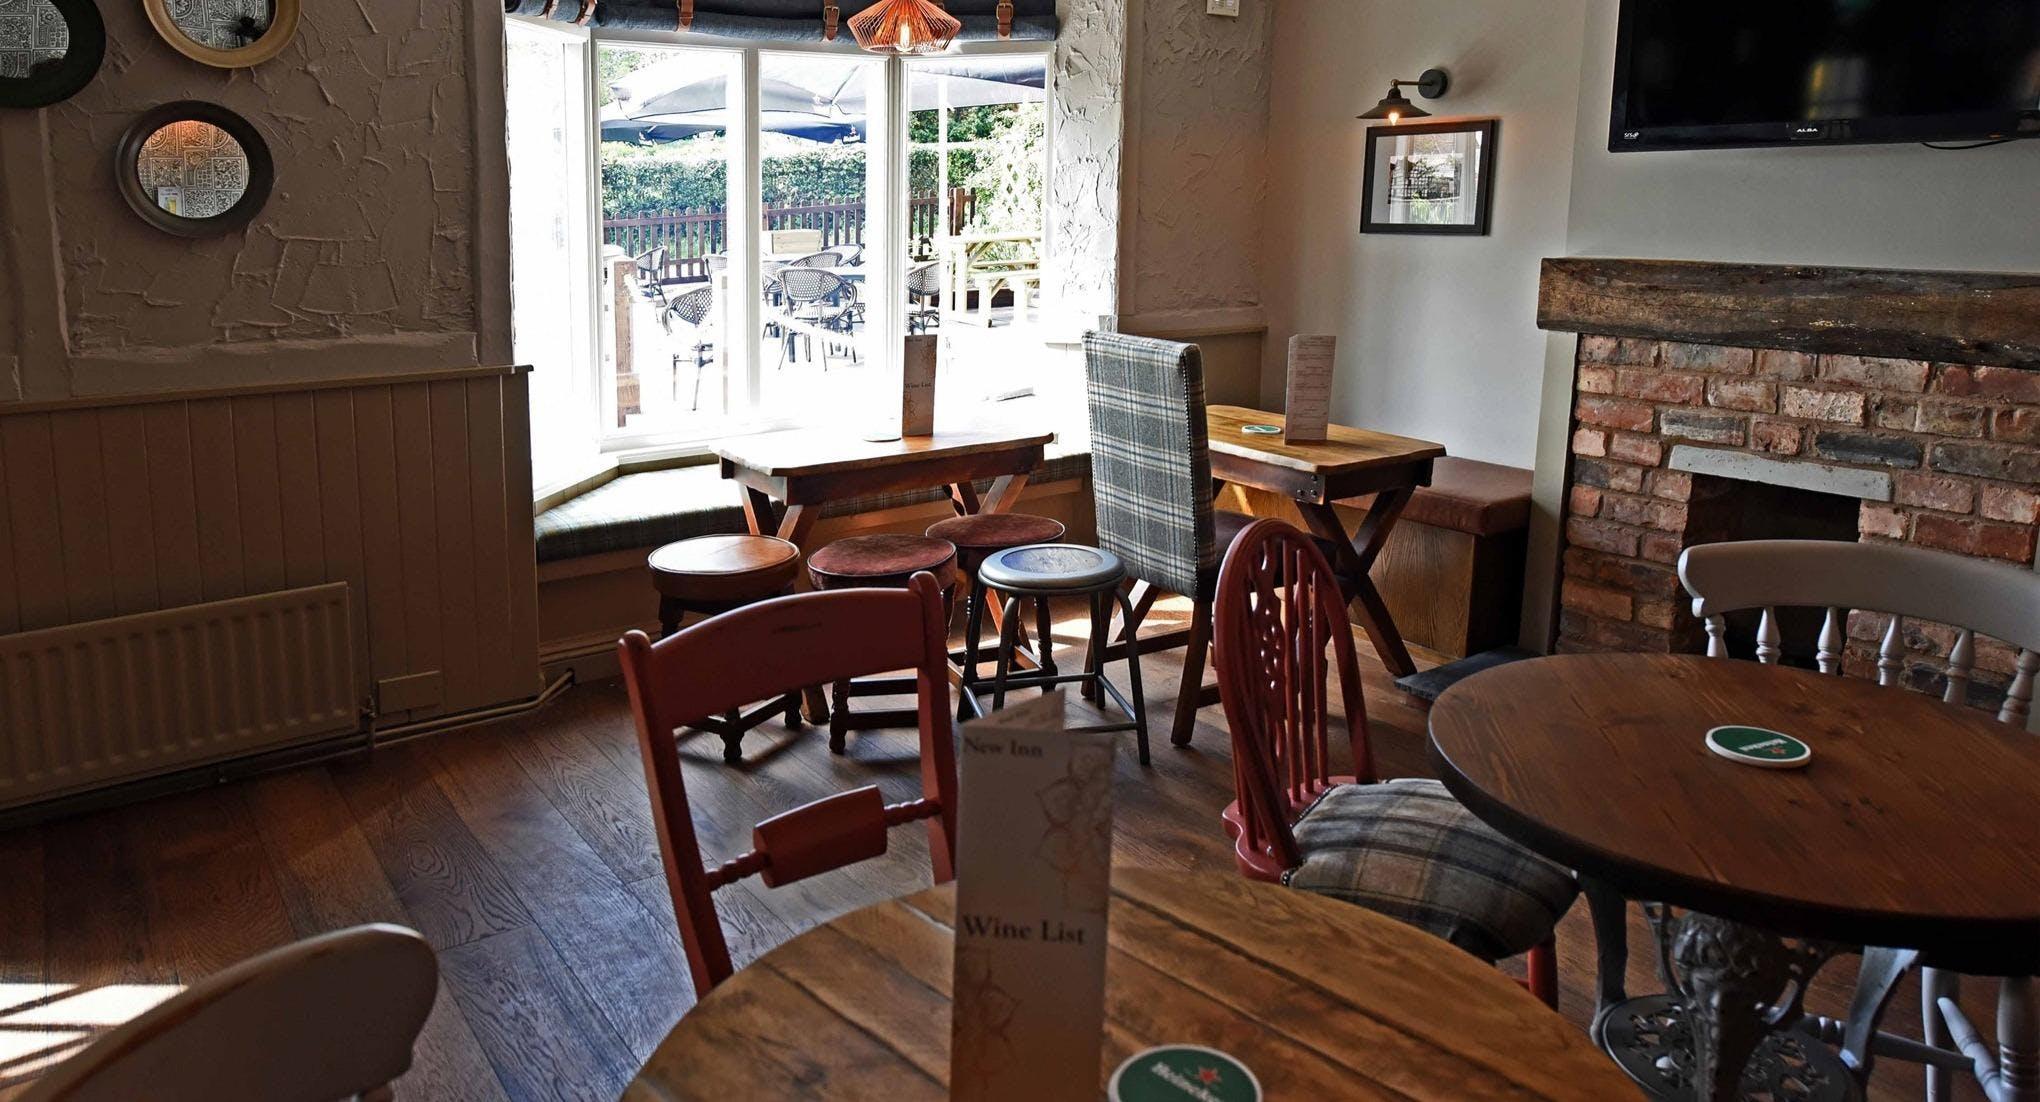 The New Inn - Bournheath Bromsgrove image 3